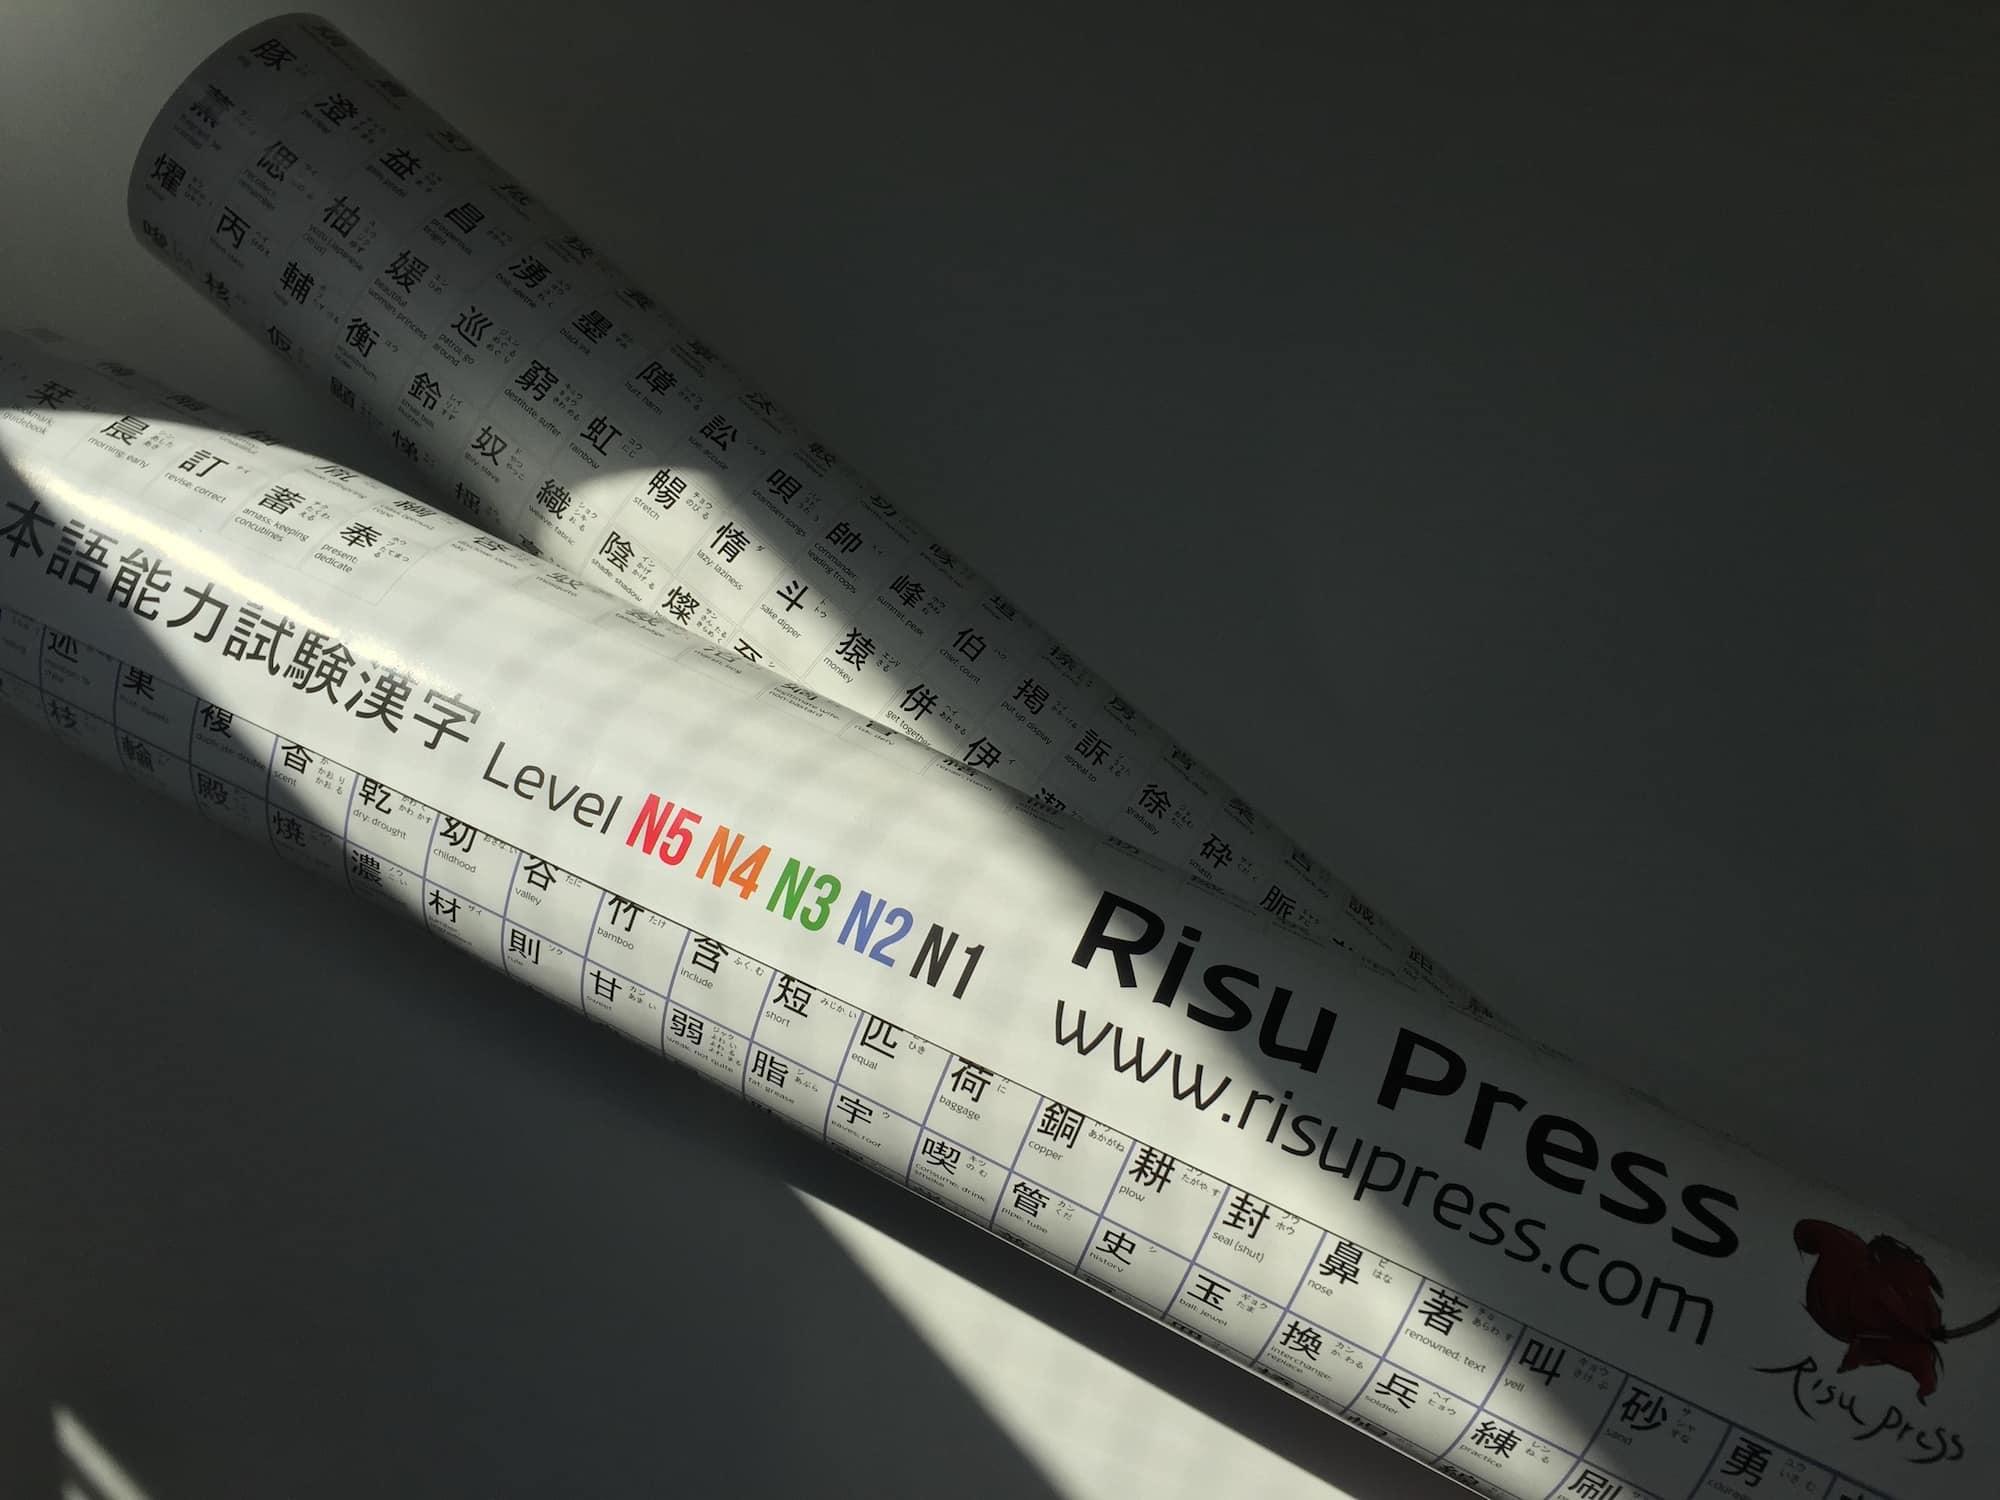 JLPT Kanji Poster Set Rolled